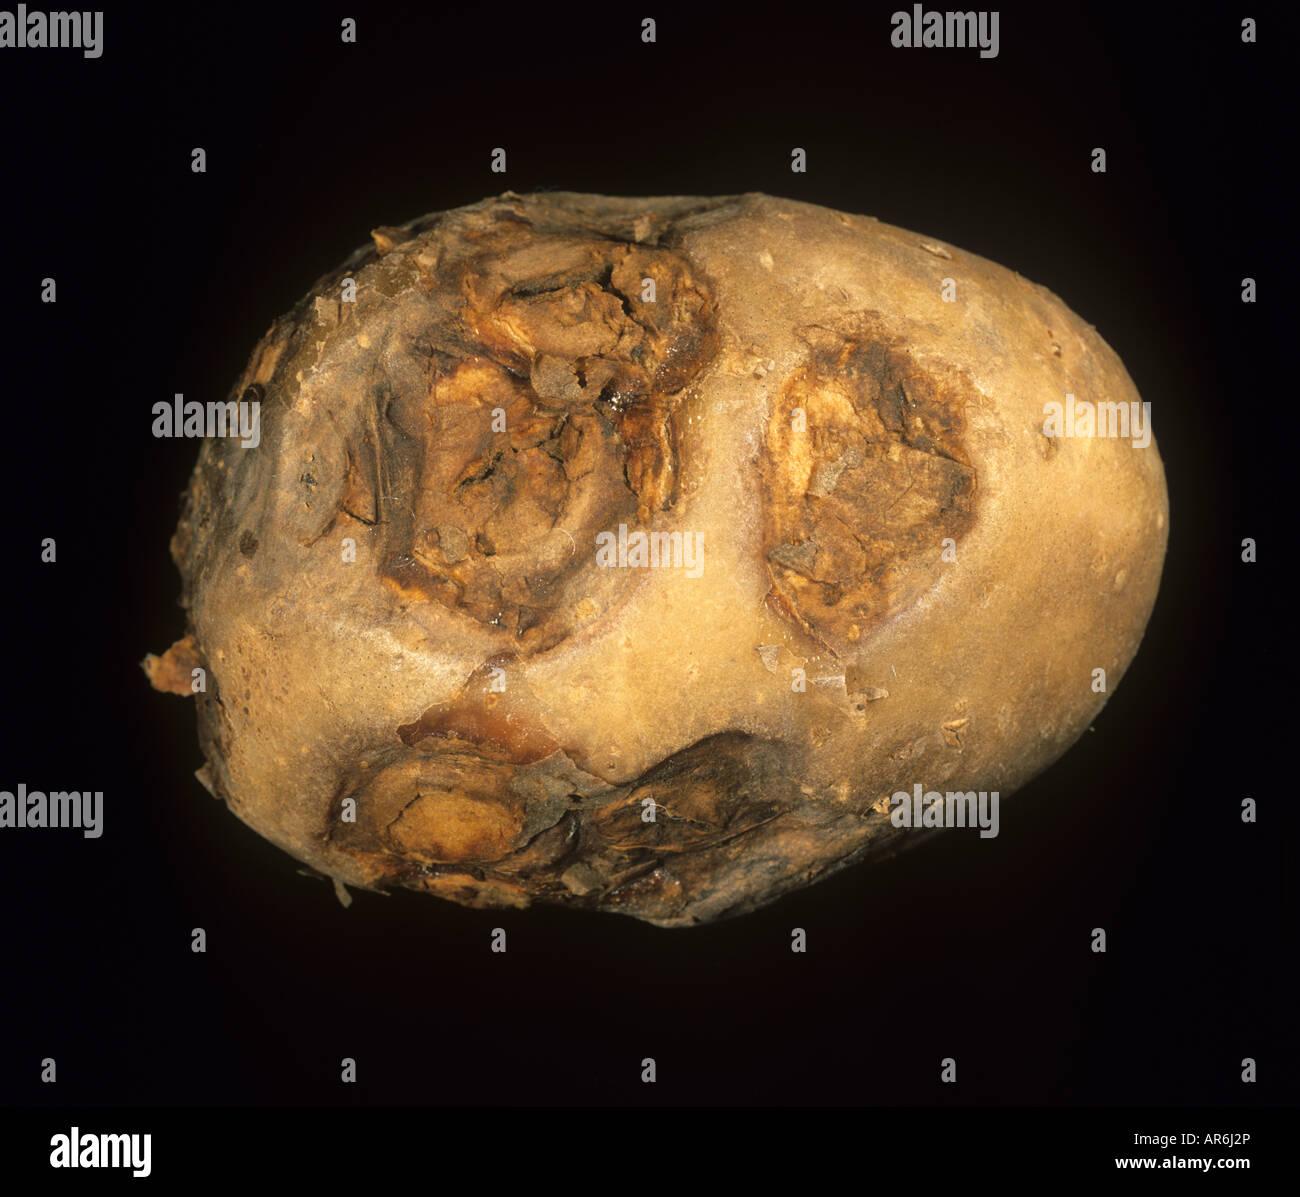 Tuber symptoms of Potato virus Y ntn sunken ring spots - Stock Image